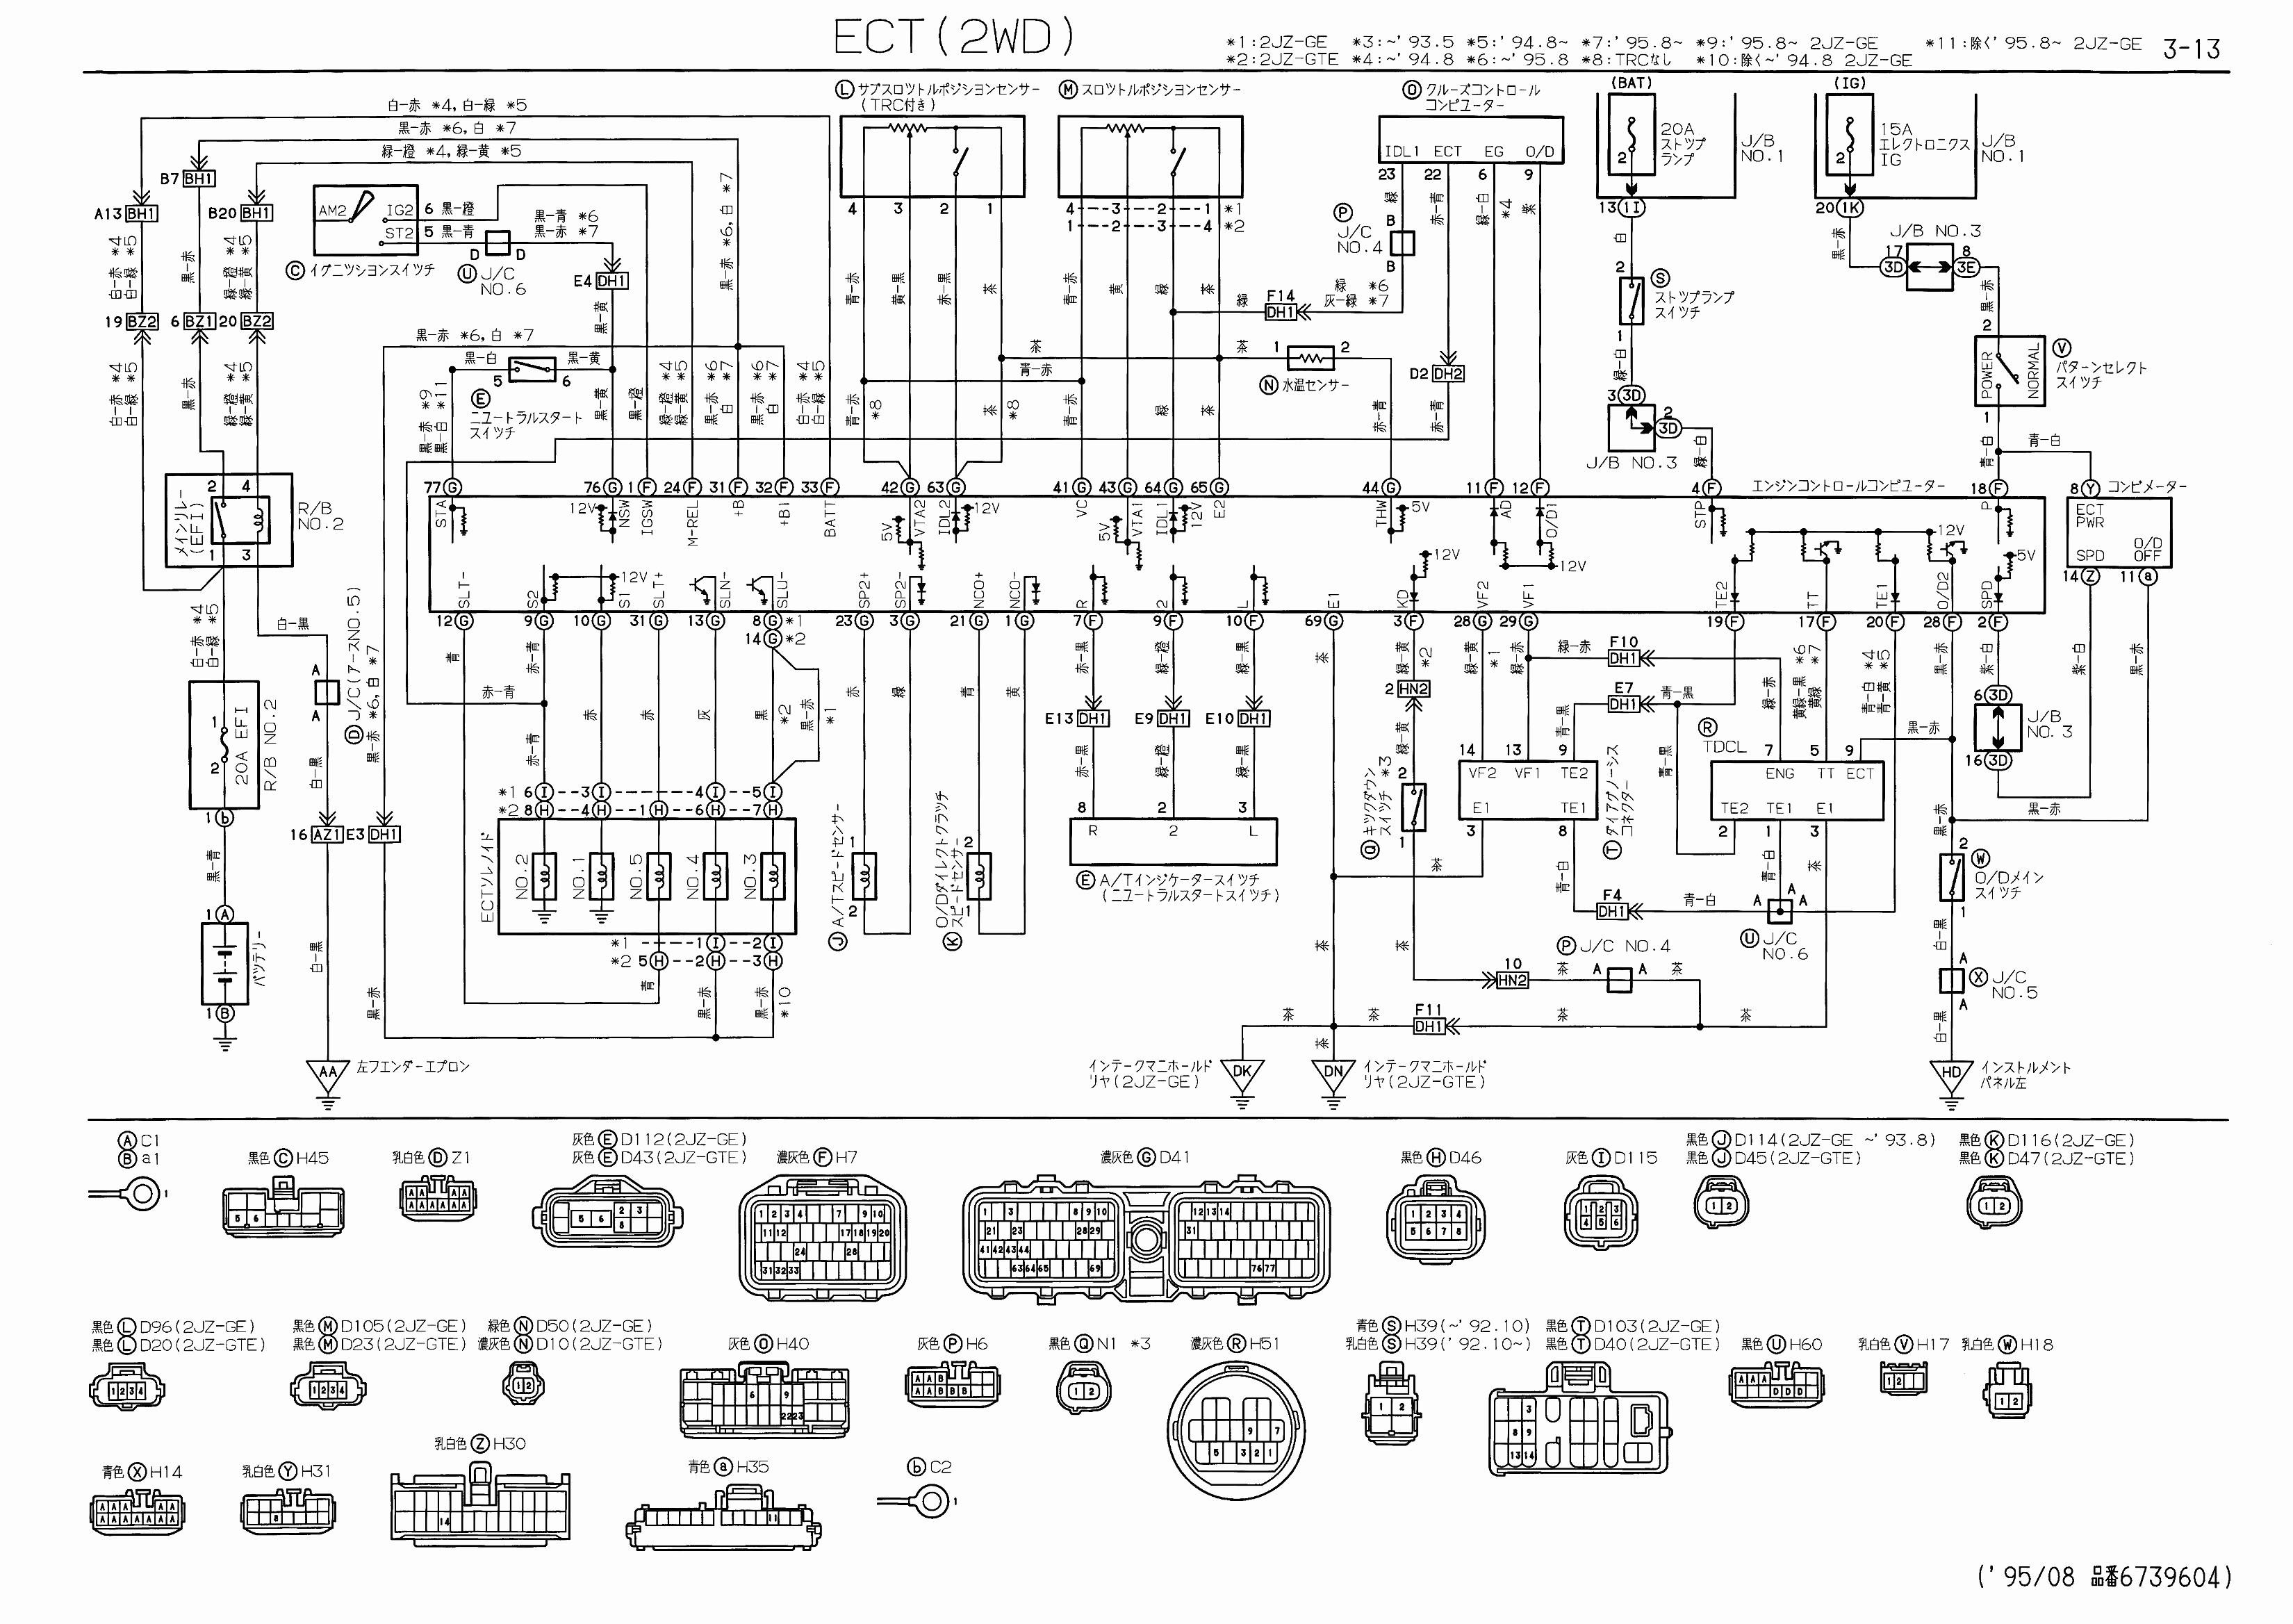 infiniti fx35 fuse box diagram wiring diagraminfiniti fx35 electrical diagram wiring diagraminfiniti fx engine diagram wiring diagramfuse box for infiniti fx35 wiring